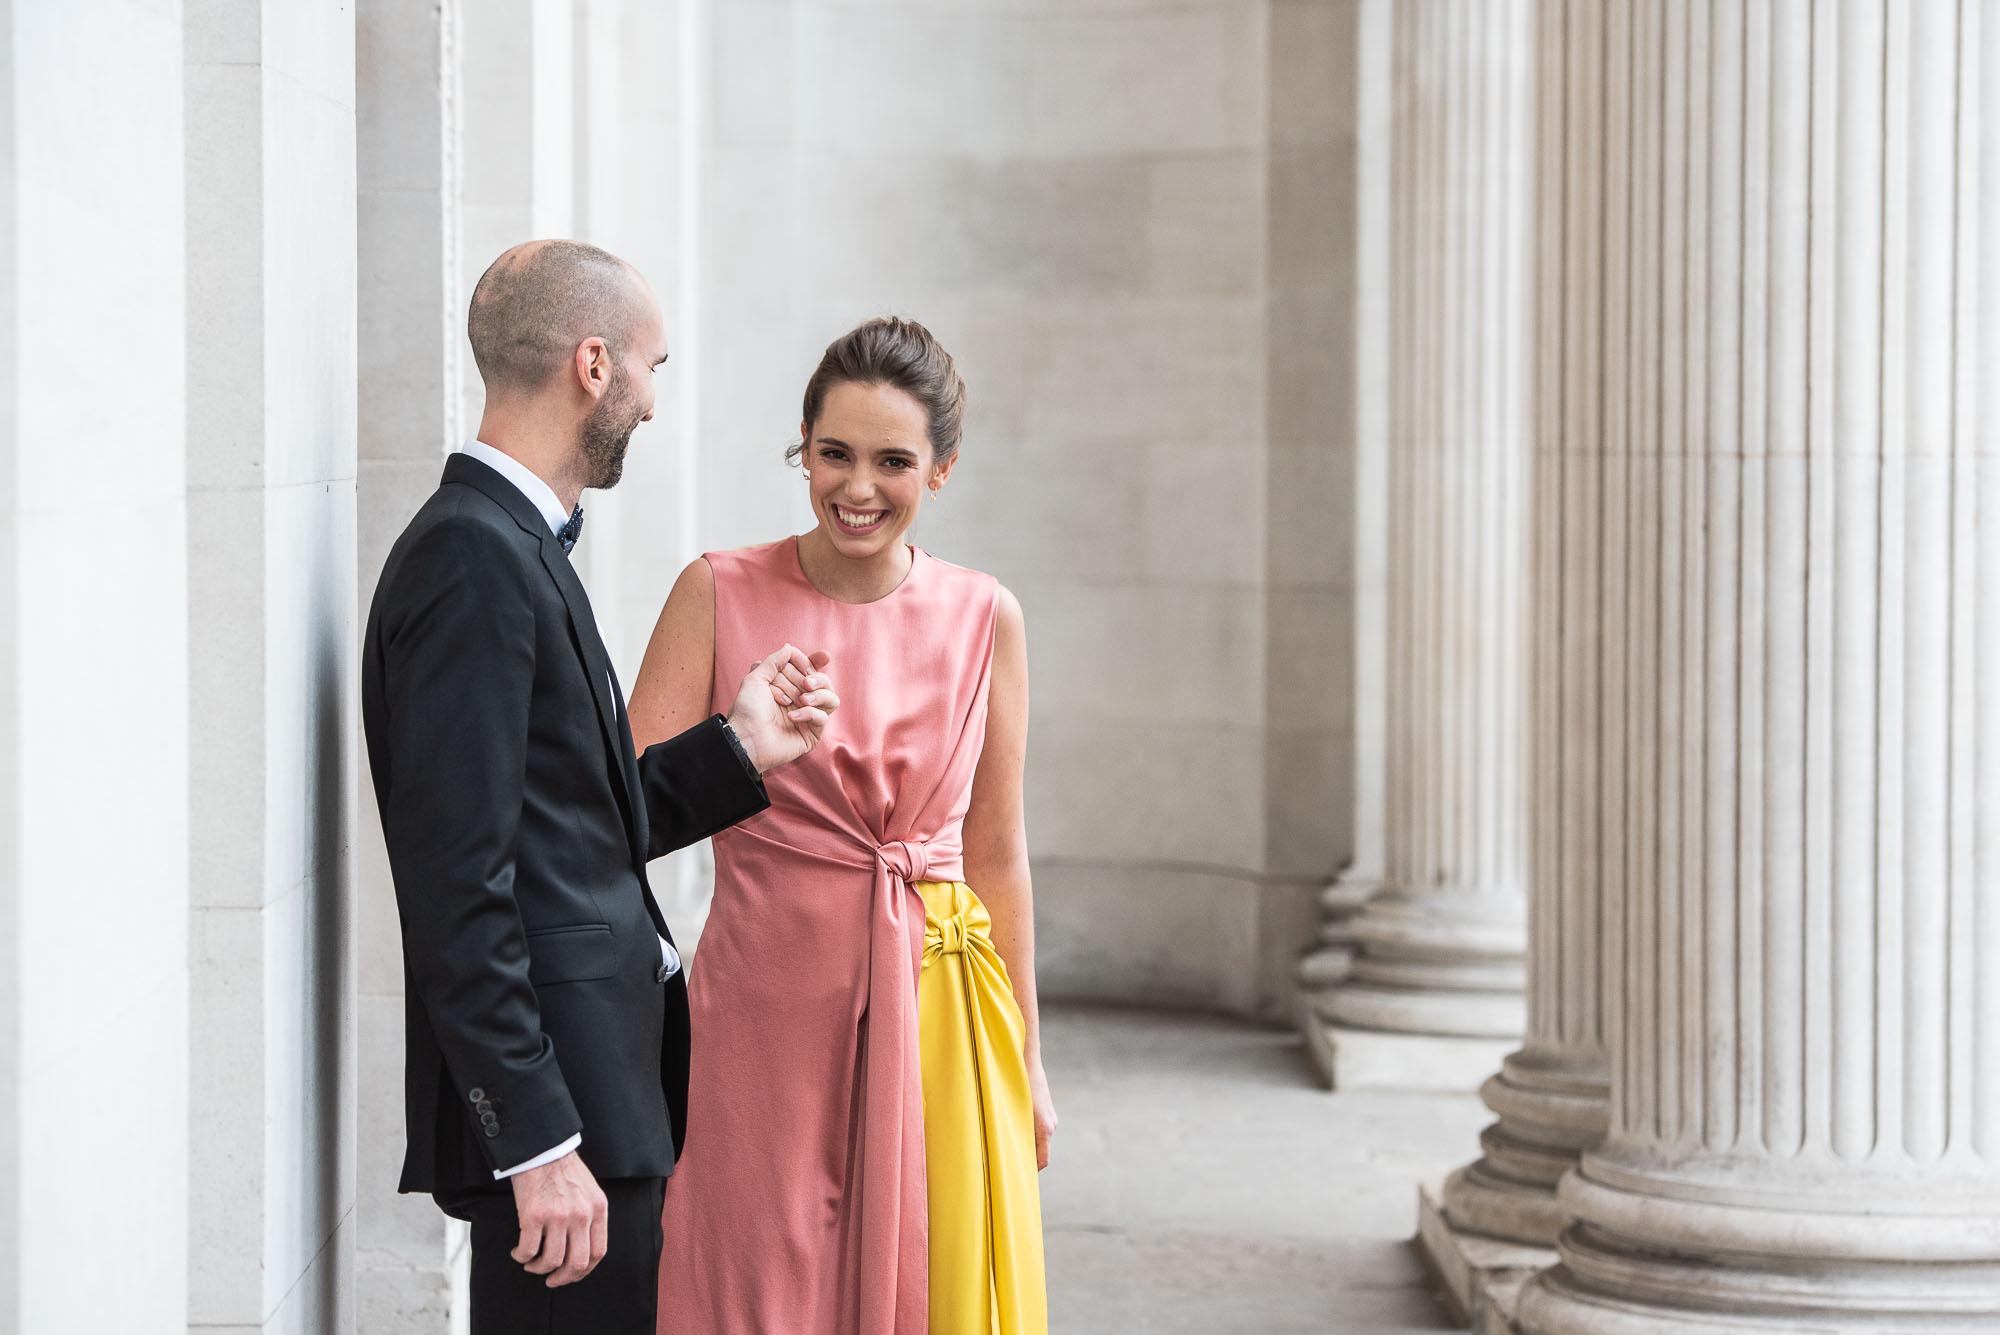 Our Wedding_HR (35 of 176).jpg